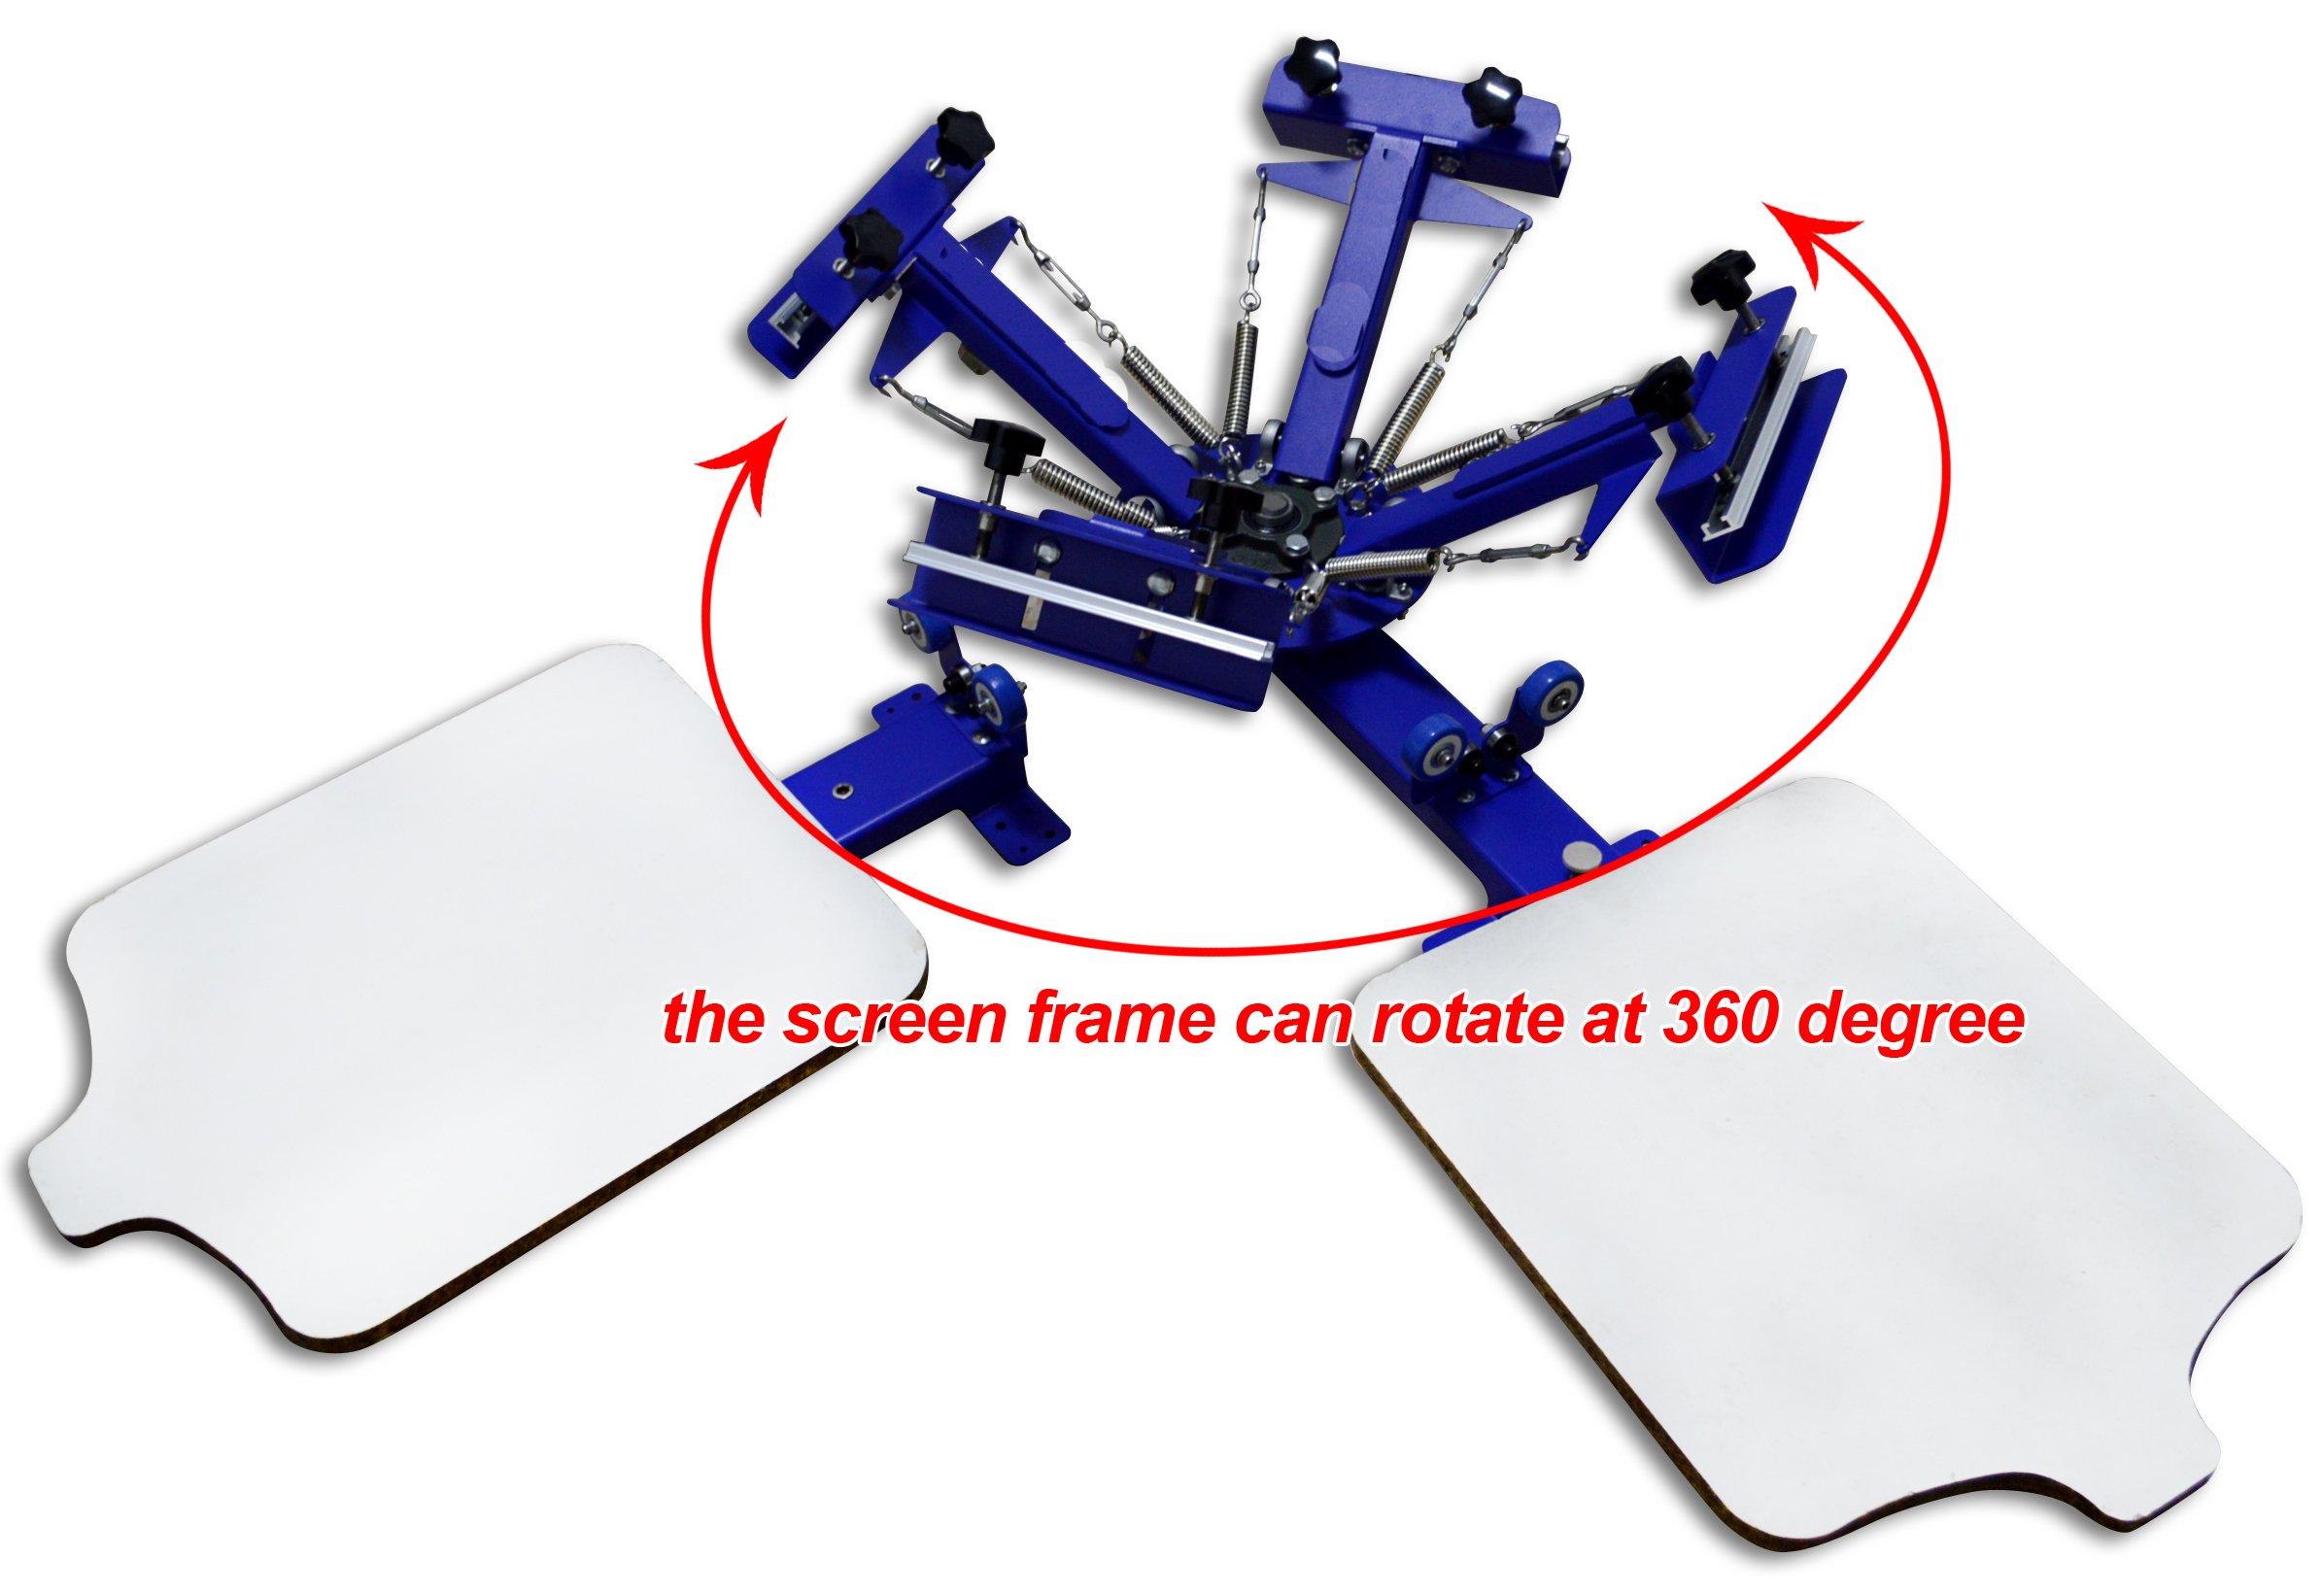 Screen Printing Machine Silk Screen Printing Machine Screen Printing Press 4 Color 2 Station T-shirt Screen Printing Equipment DIY Printer by Screen Printing Machine Series